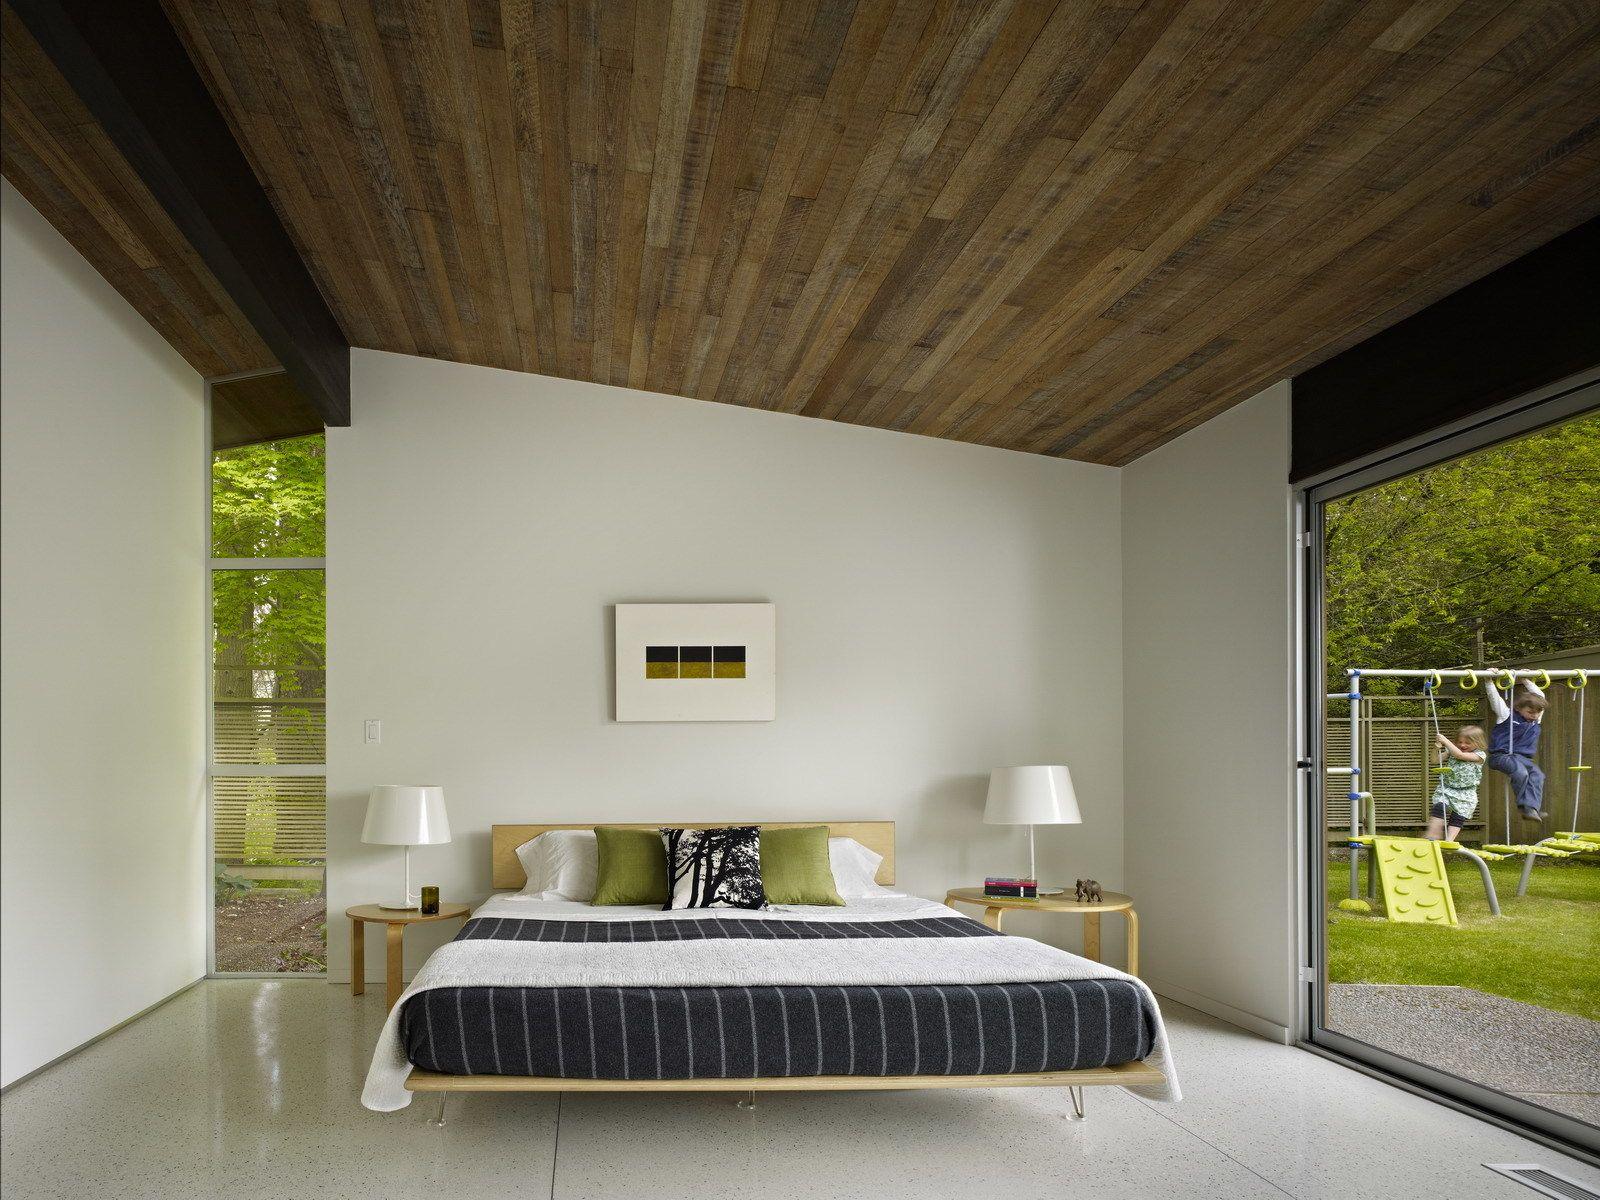 Master bedroom images  Midcentury Renovations We Love by Erika Heet  Midcentury modern